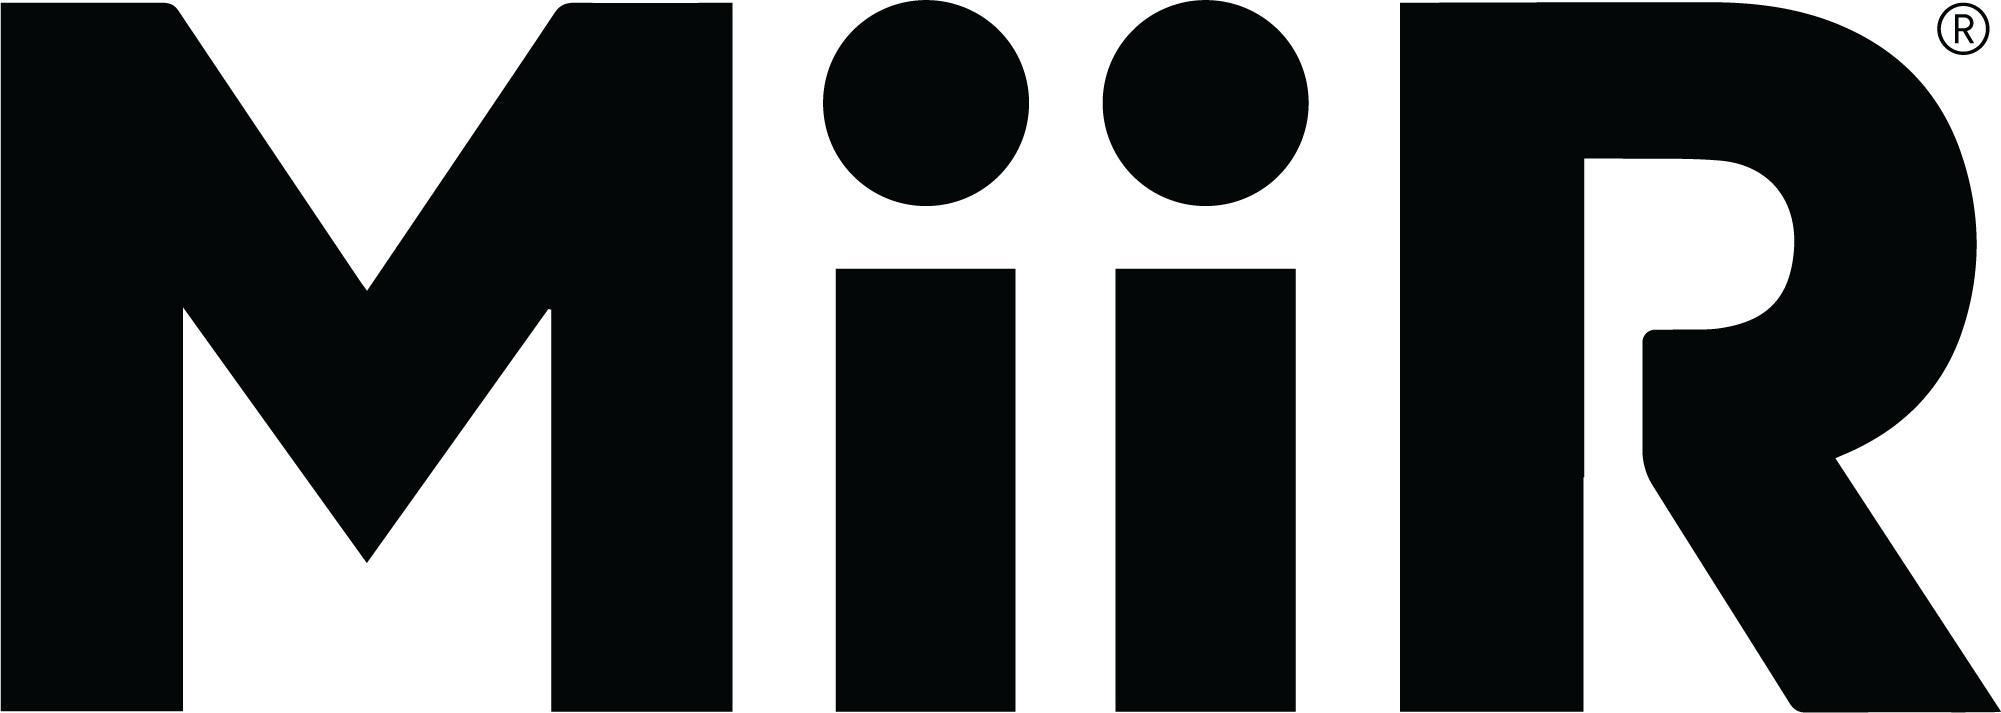 MiiR_logo_Black (1).png